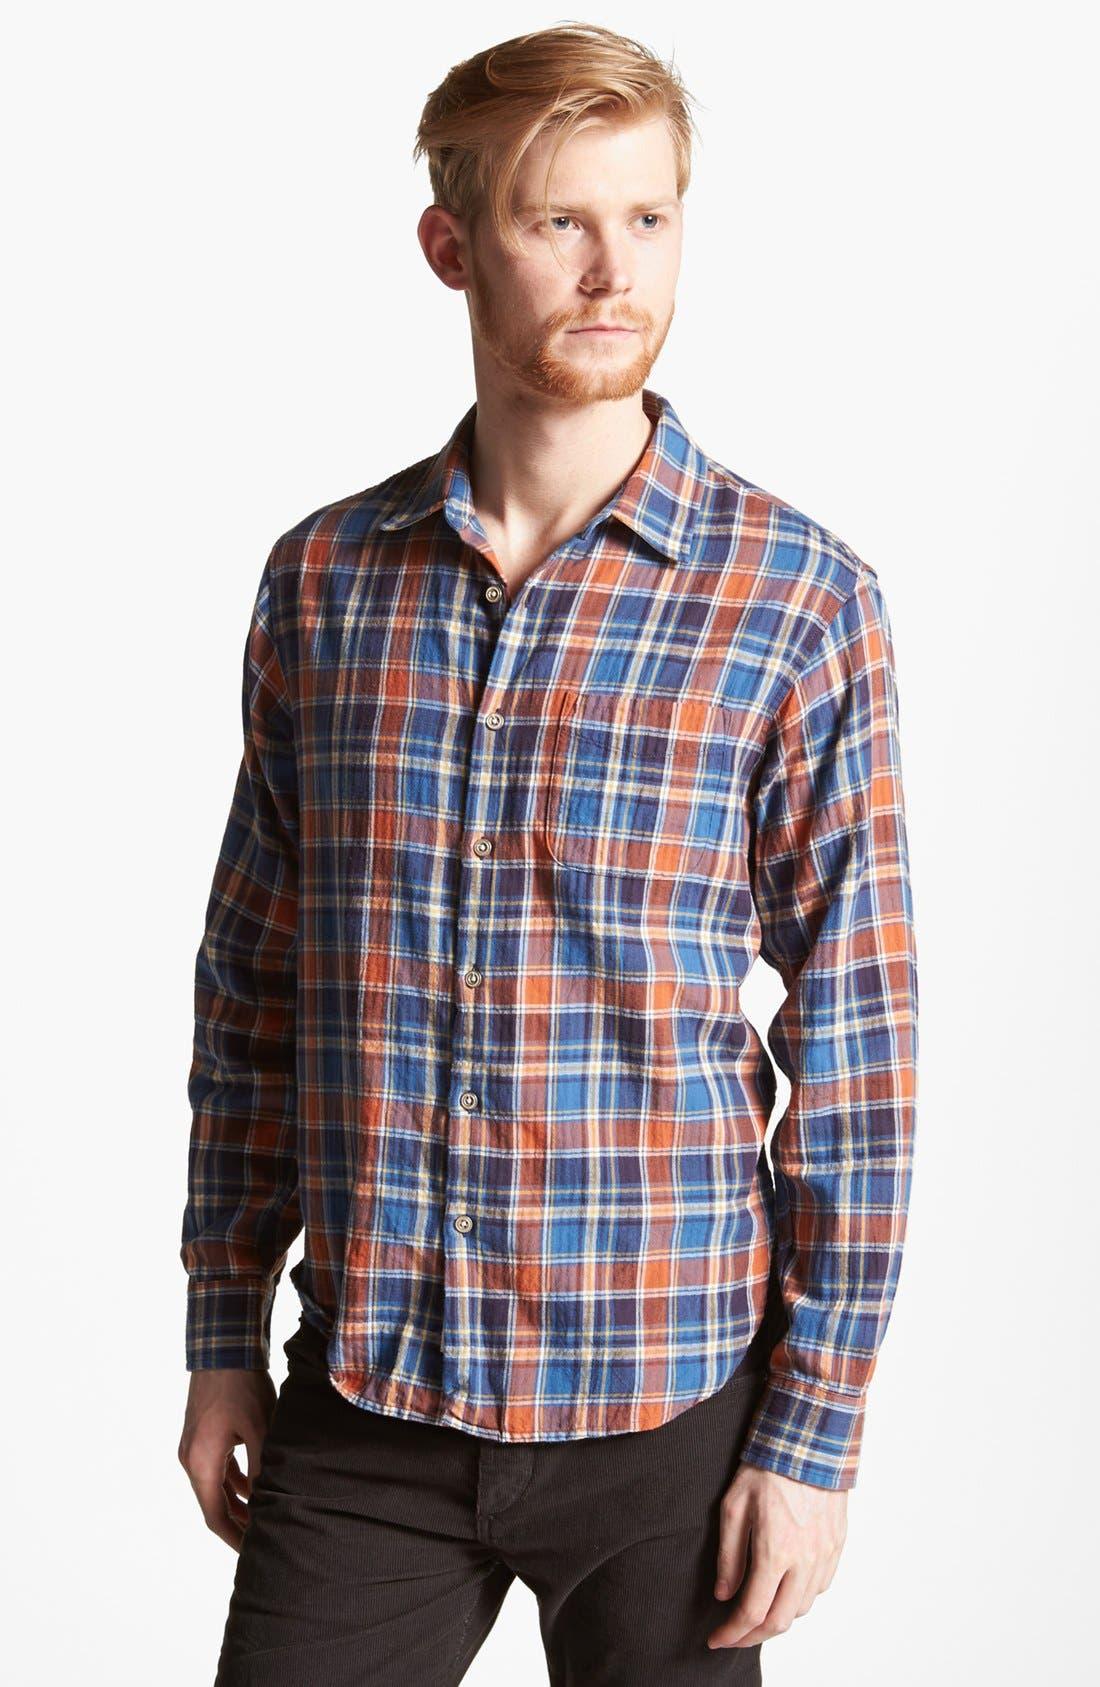 Alternate Image 1 Selected - rag & bone 'Beach' Herringbone Plaid Woven Shirt